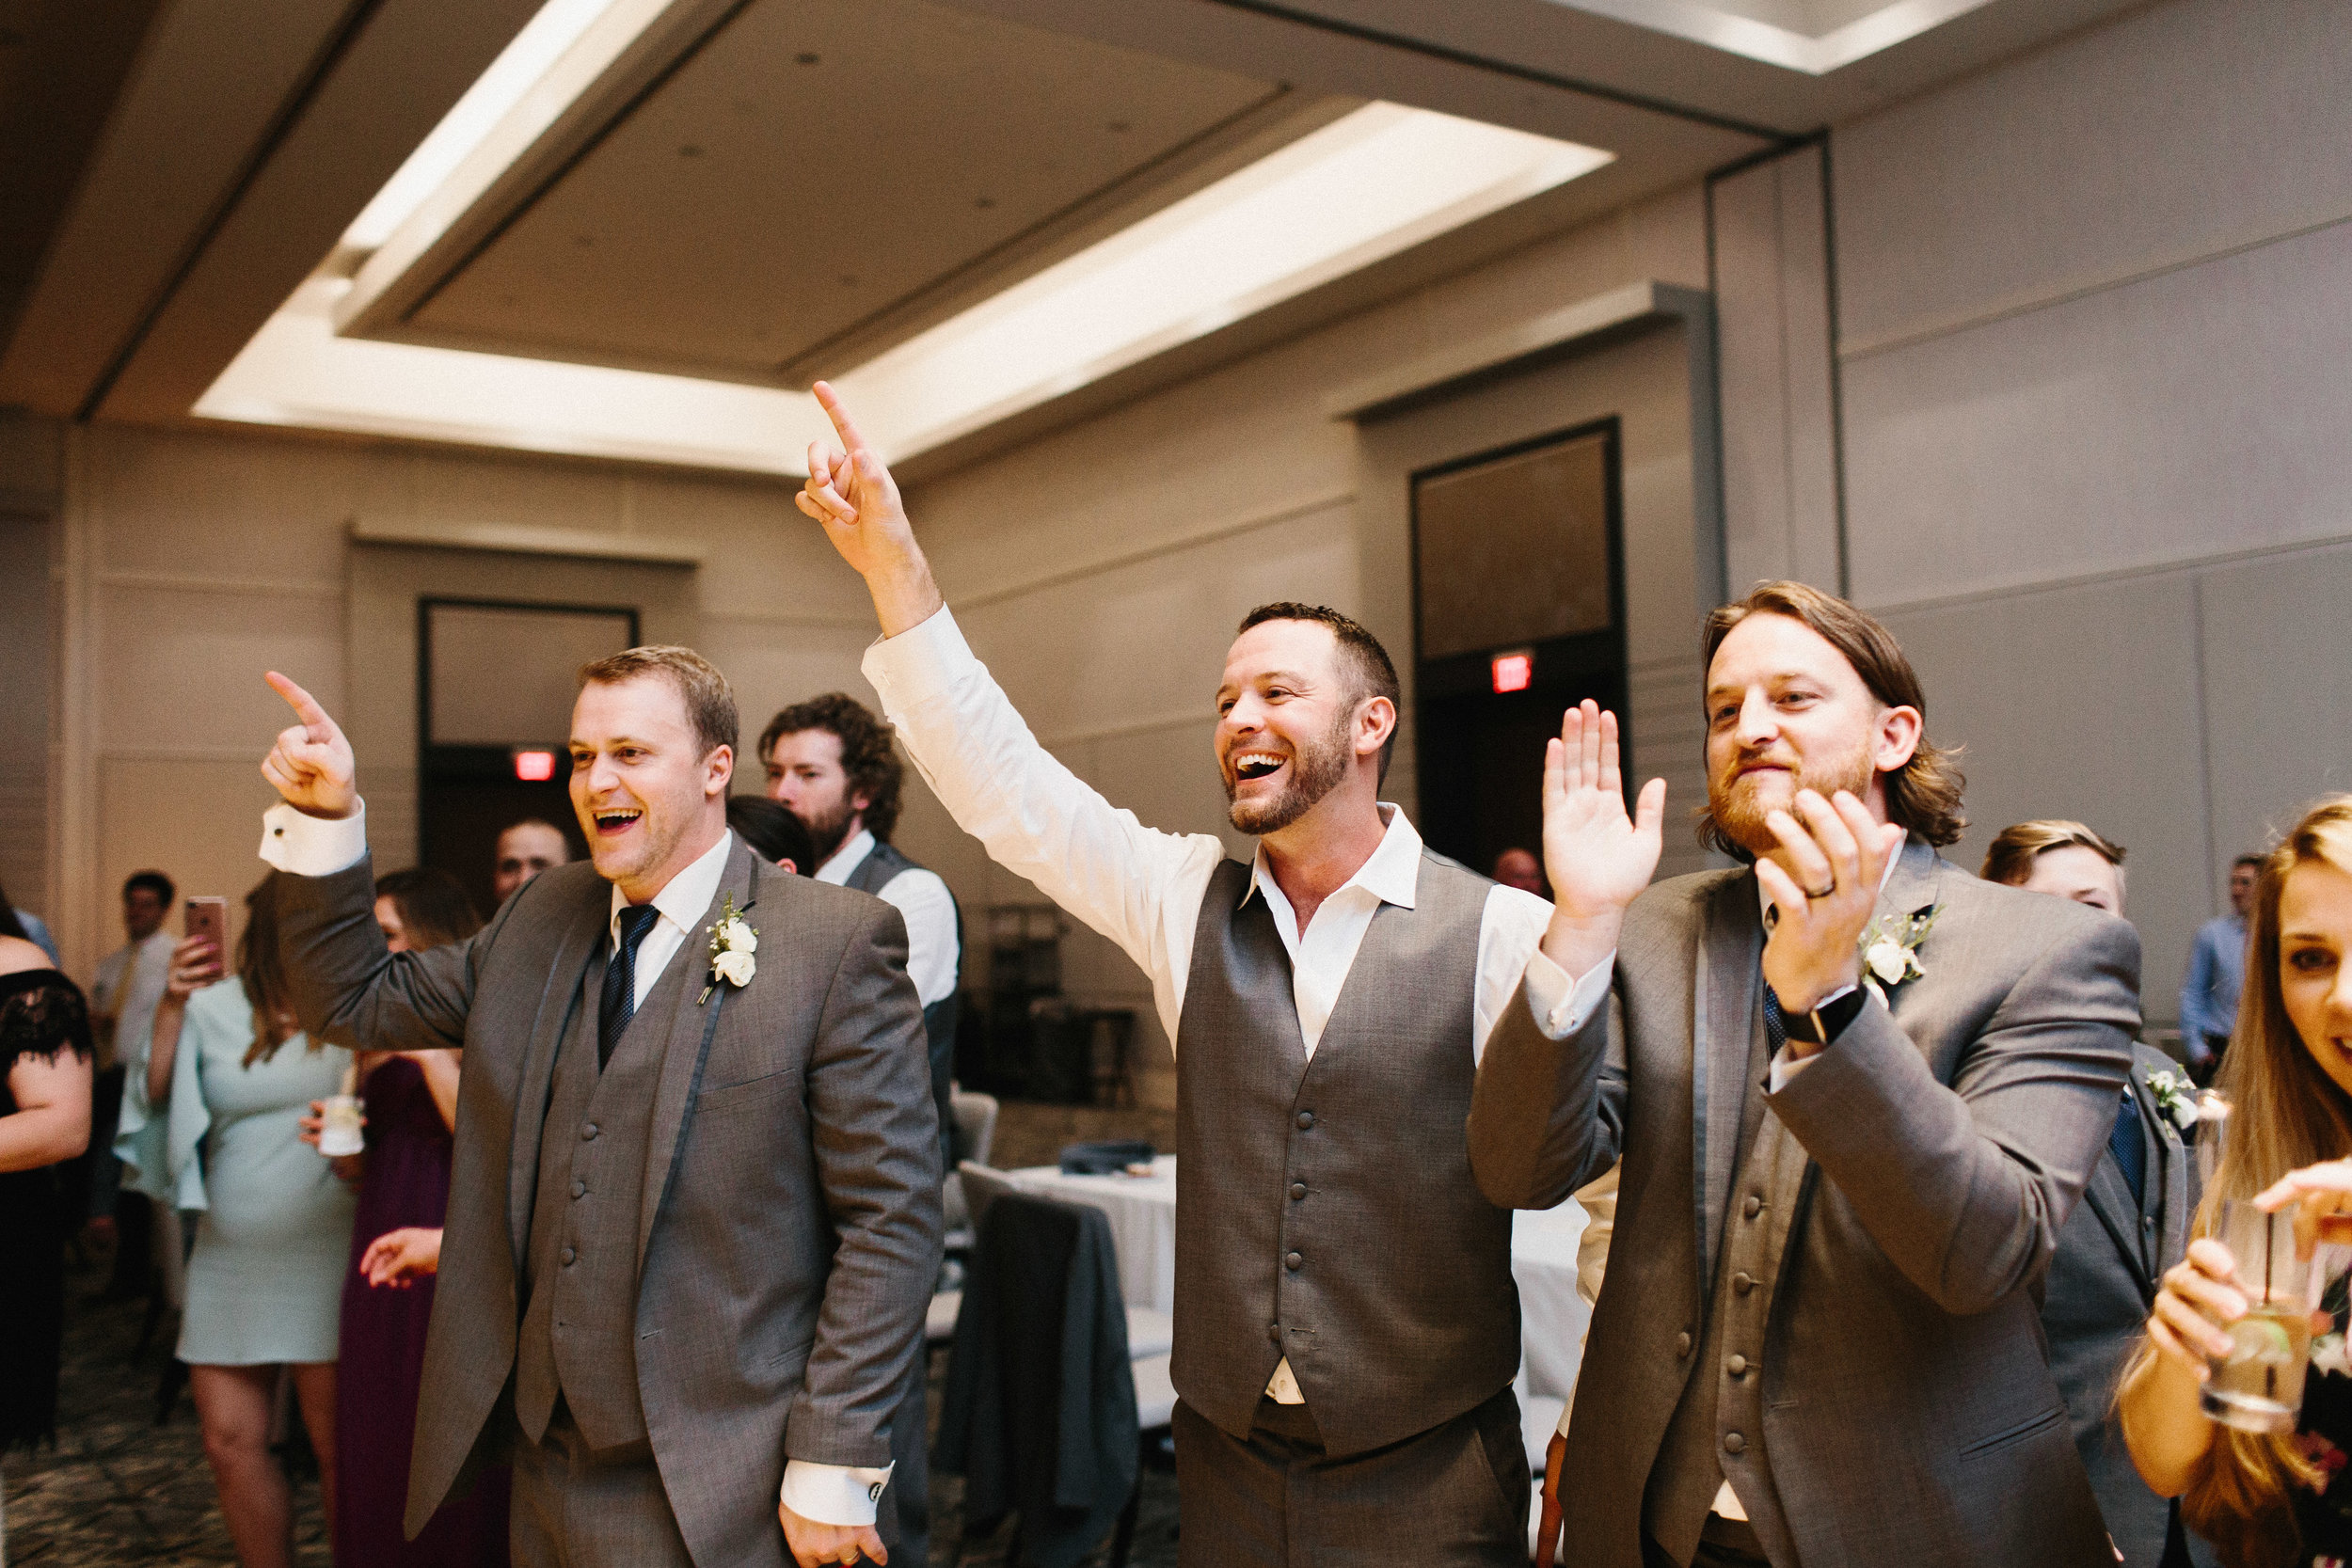 roswell_st_peter_chanel_catholic_avalon_hotel_alpharetta_wedding-2175.jpg